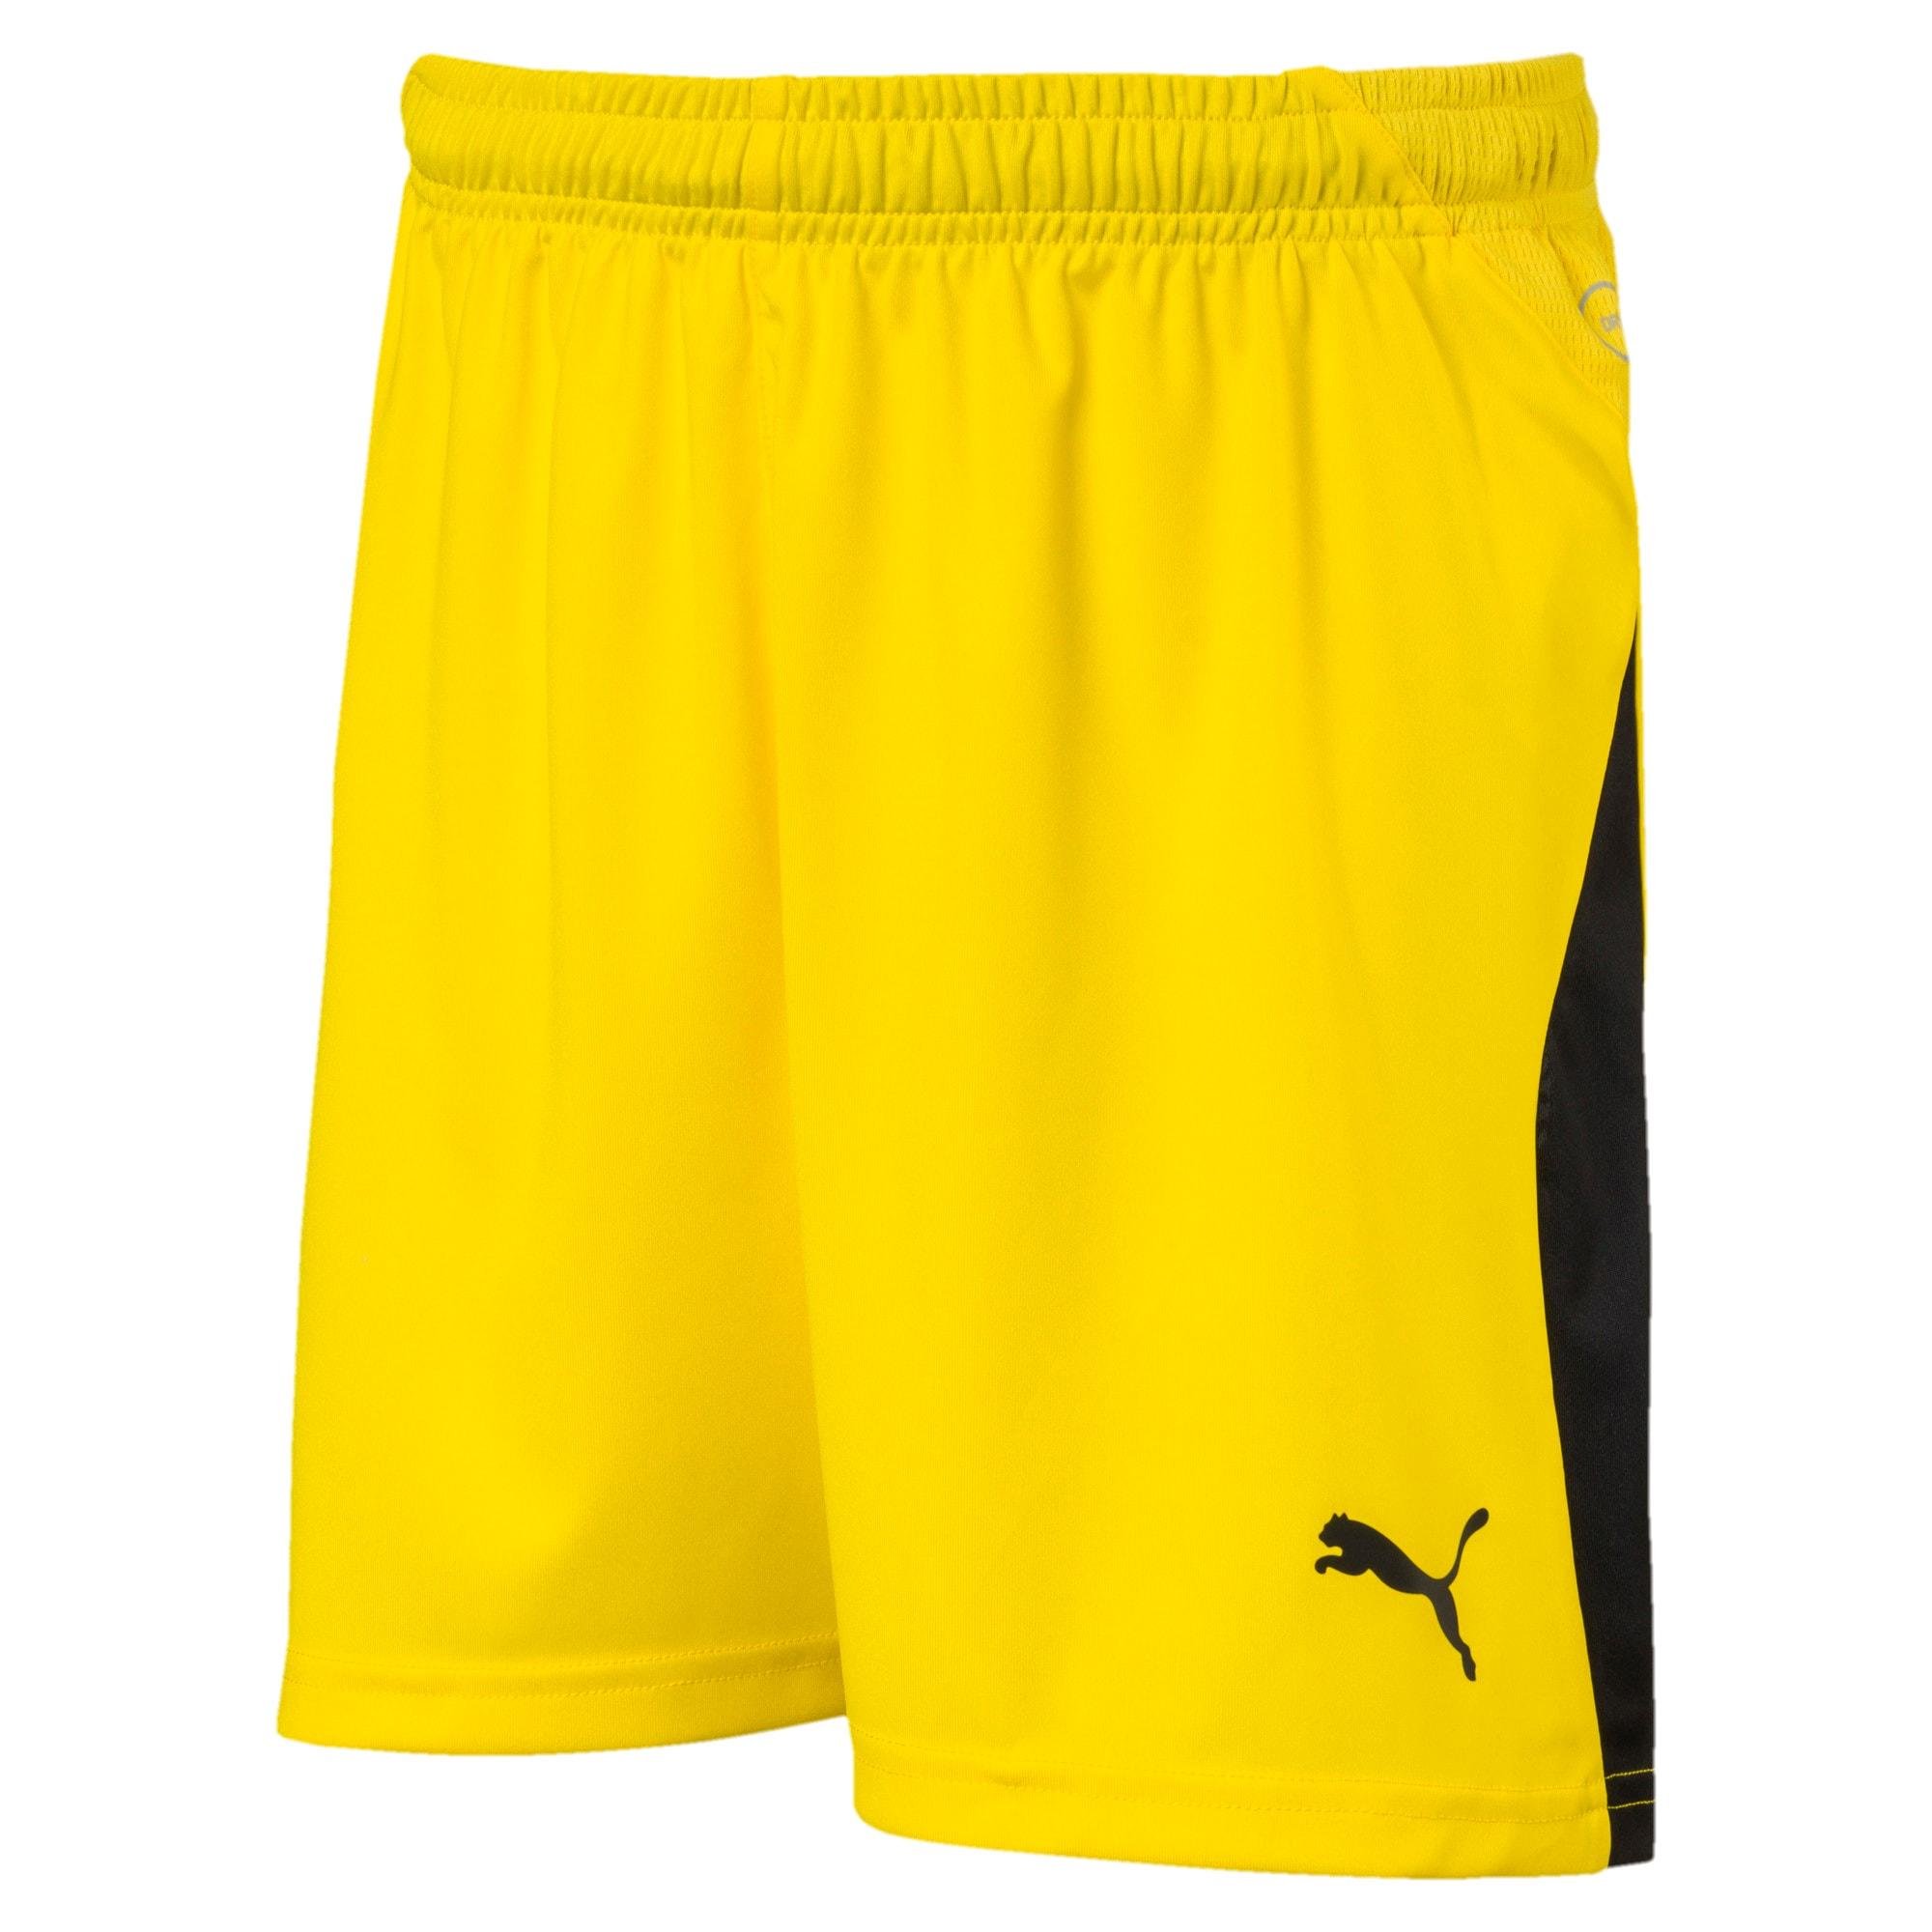 Thumbnail 1 of LIGA Kids' Football Shorts, Cyber Yellow-Puma Black, medium